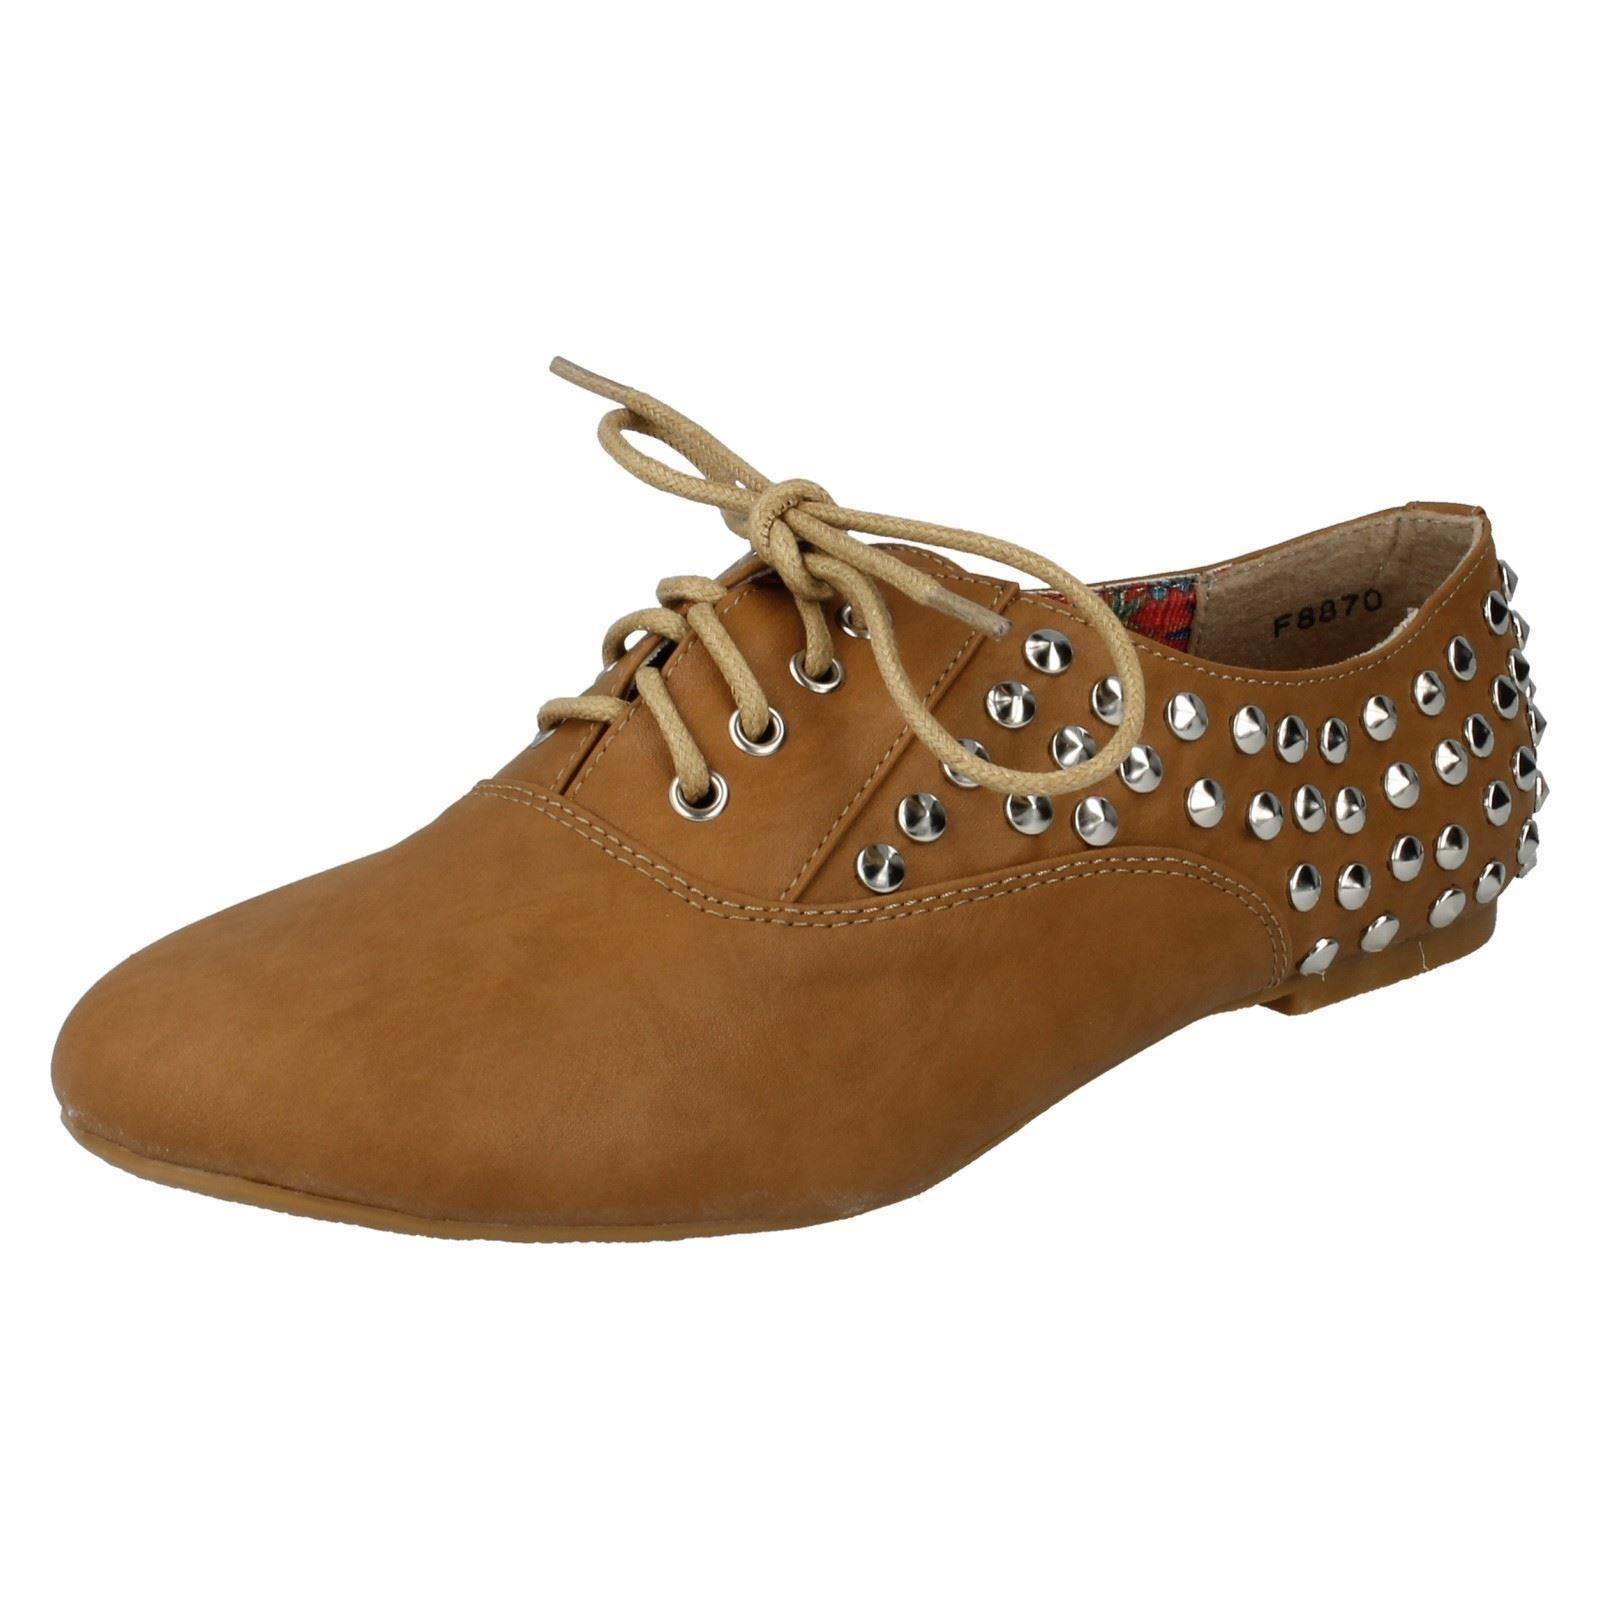 Spot On Tachuelas f8870 Mujer Tostado Piel Sintética Con Tachuelas On  Zapatos  de cordones ( 335963